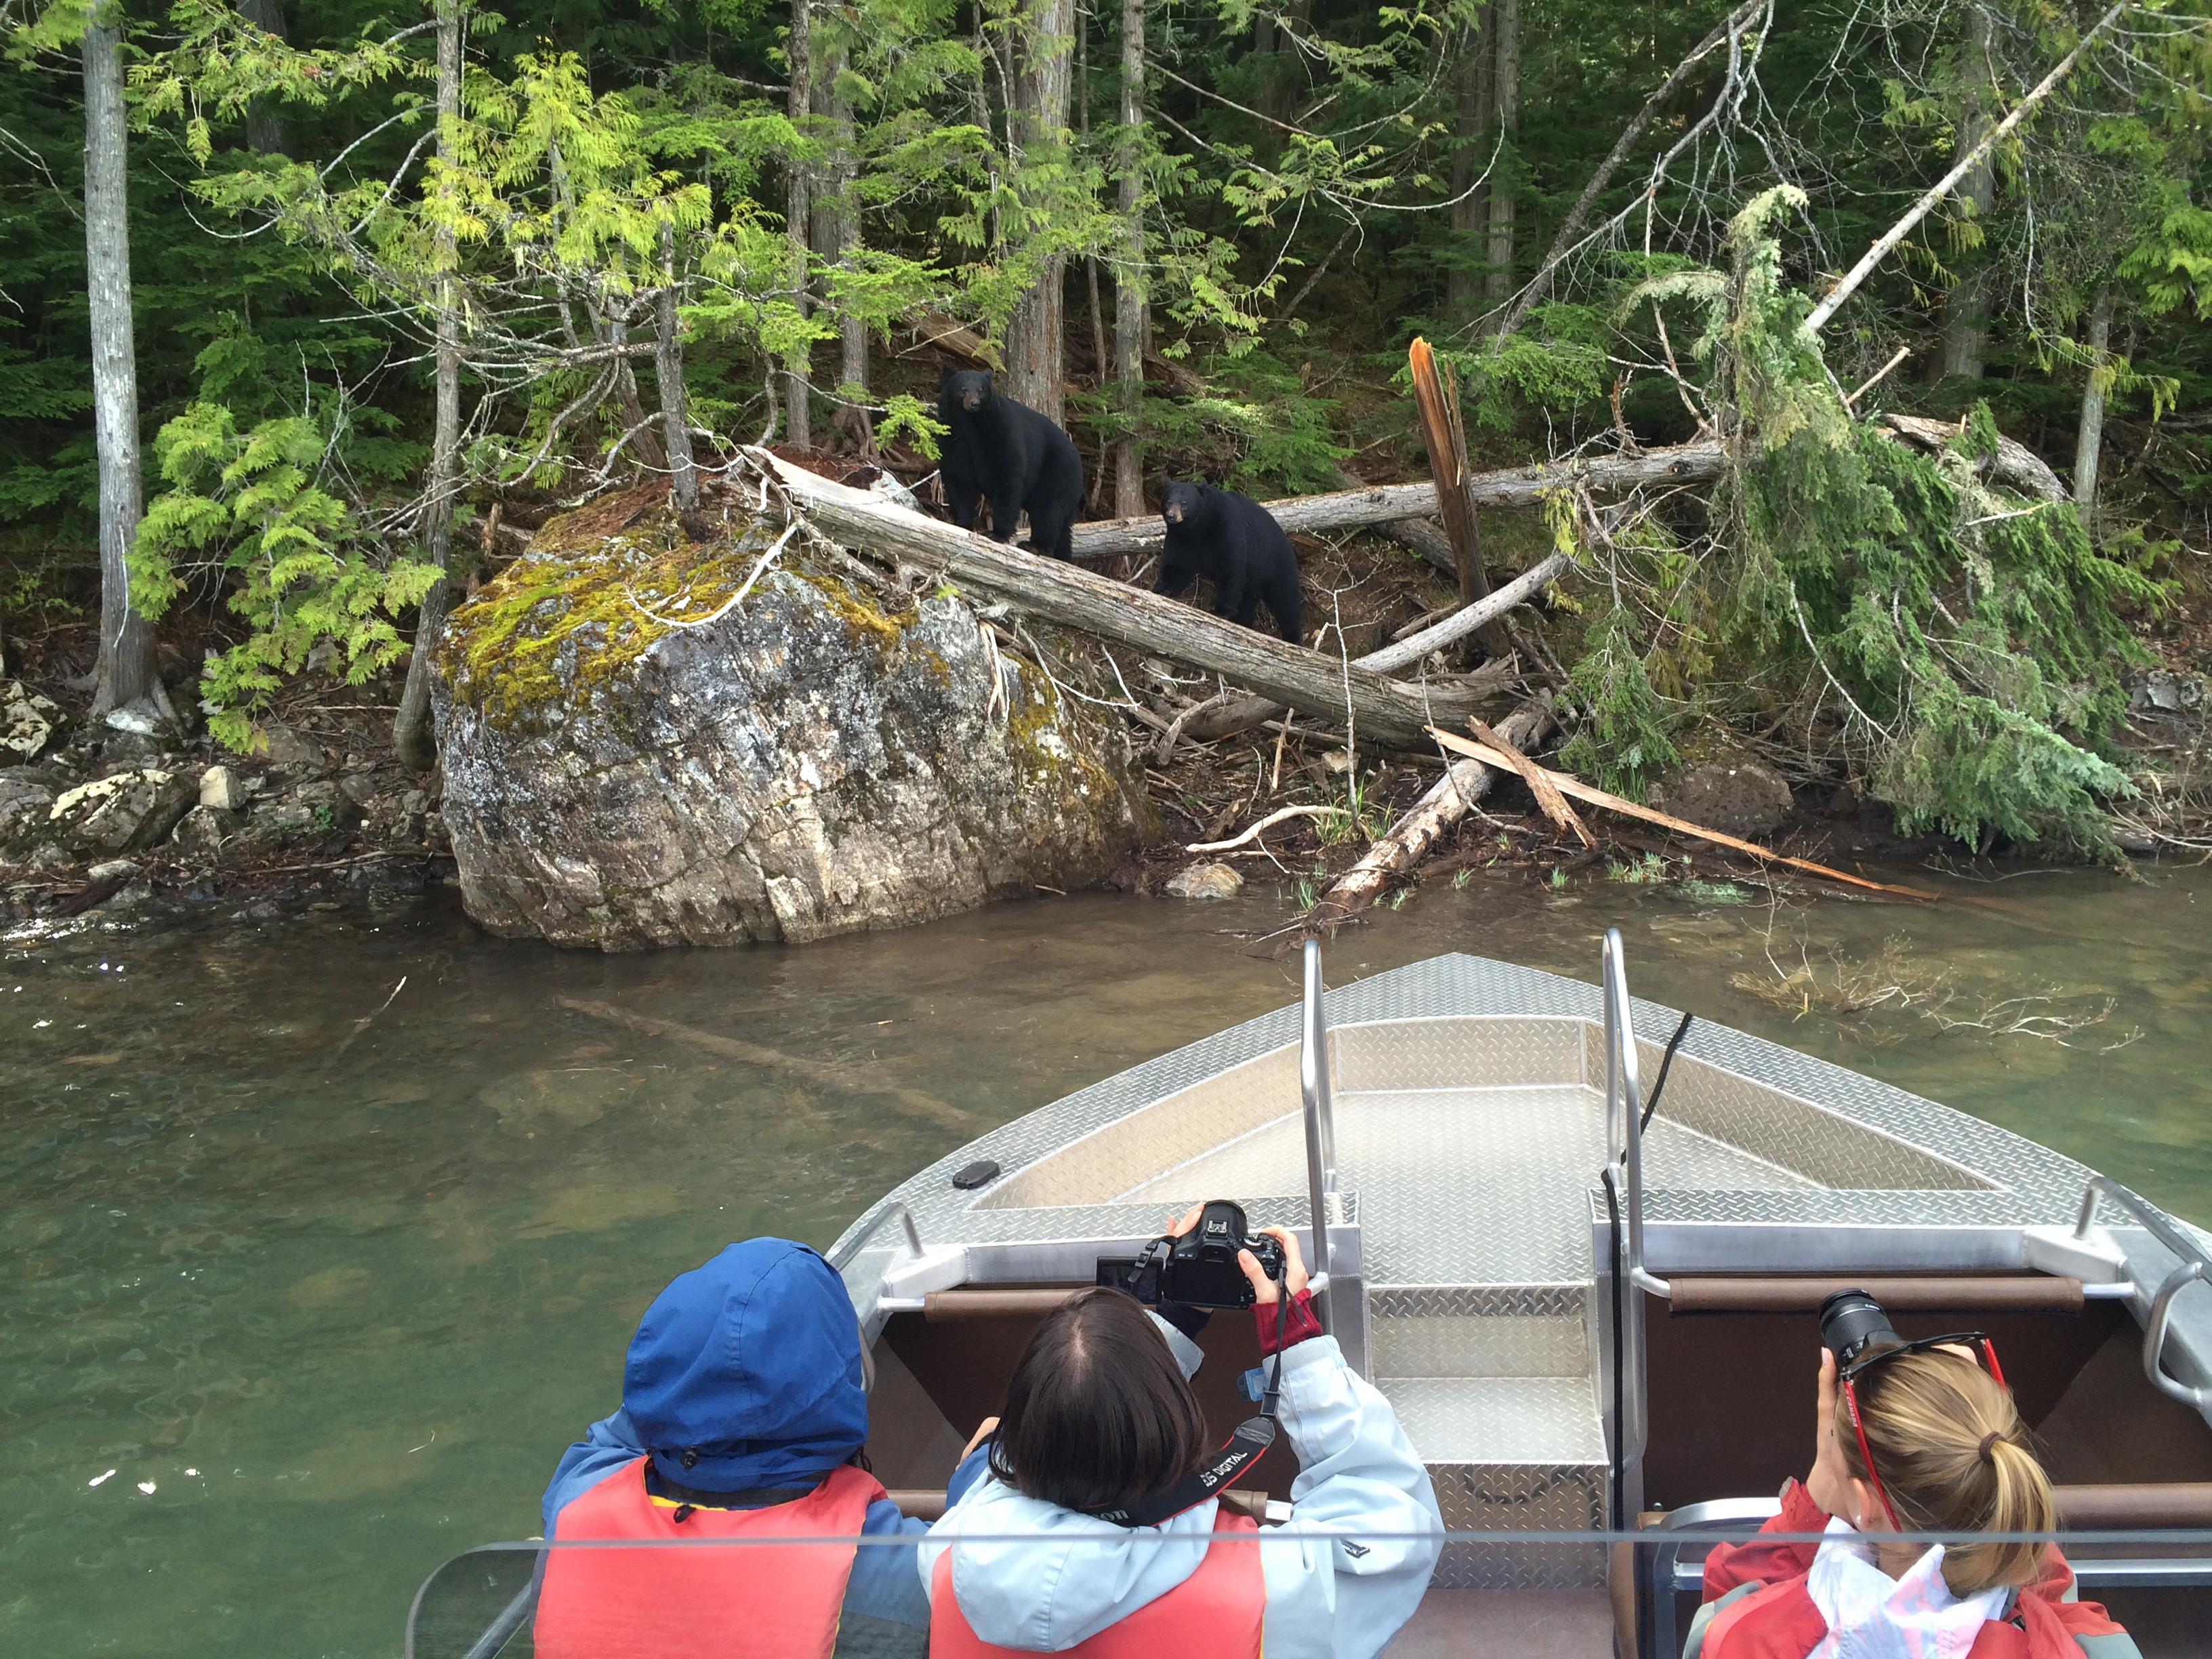 Two bears near Blue River, Thompson